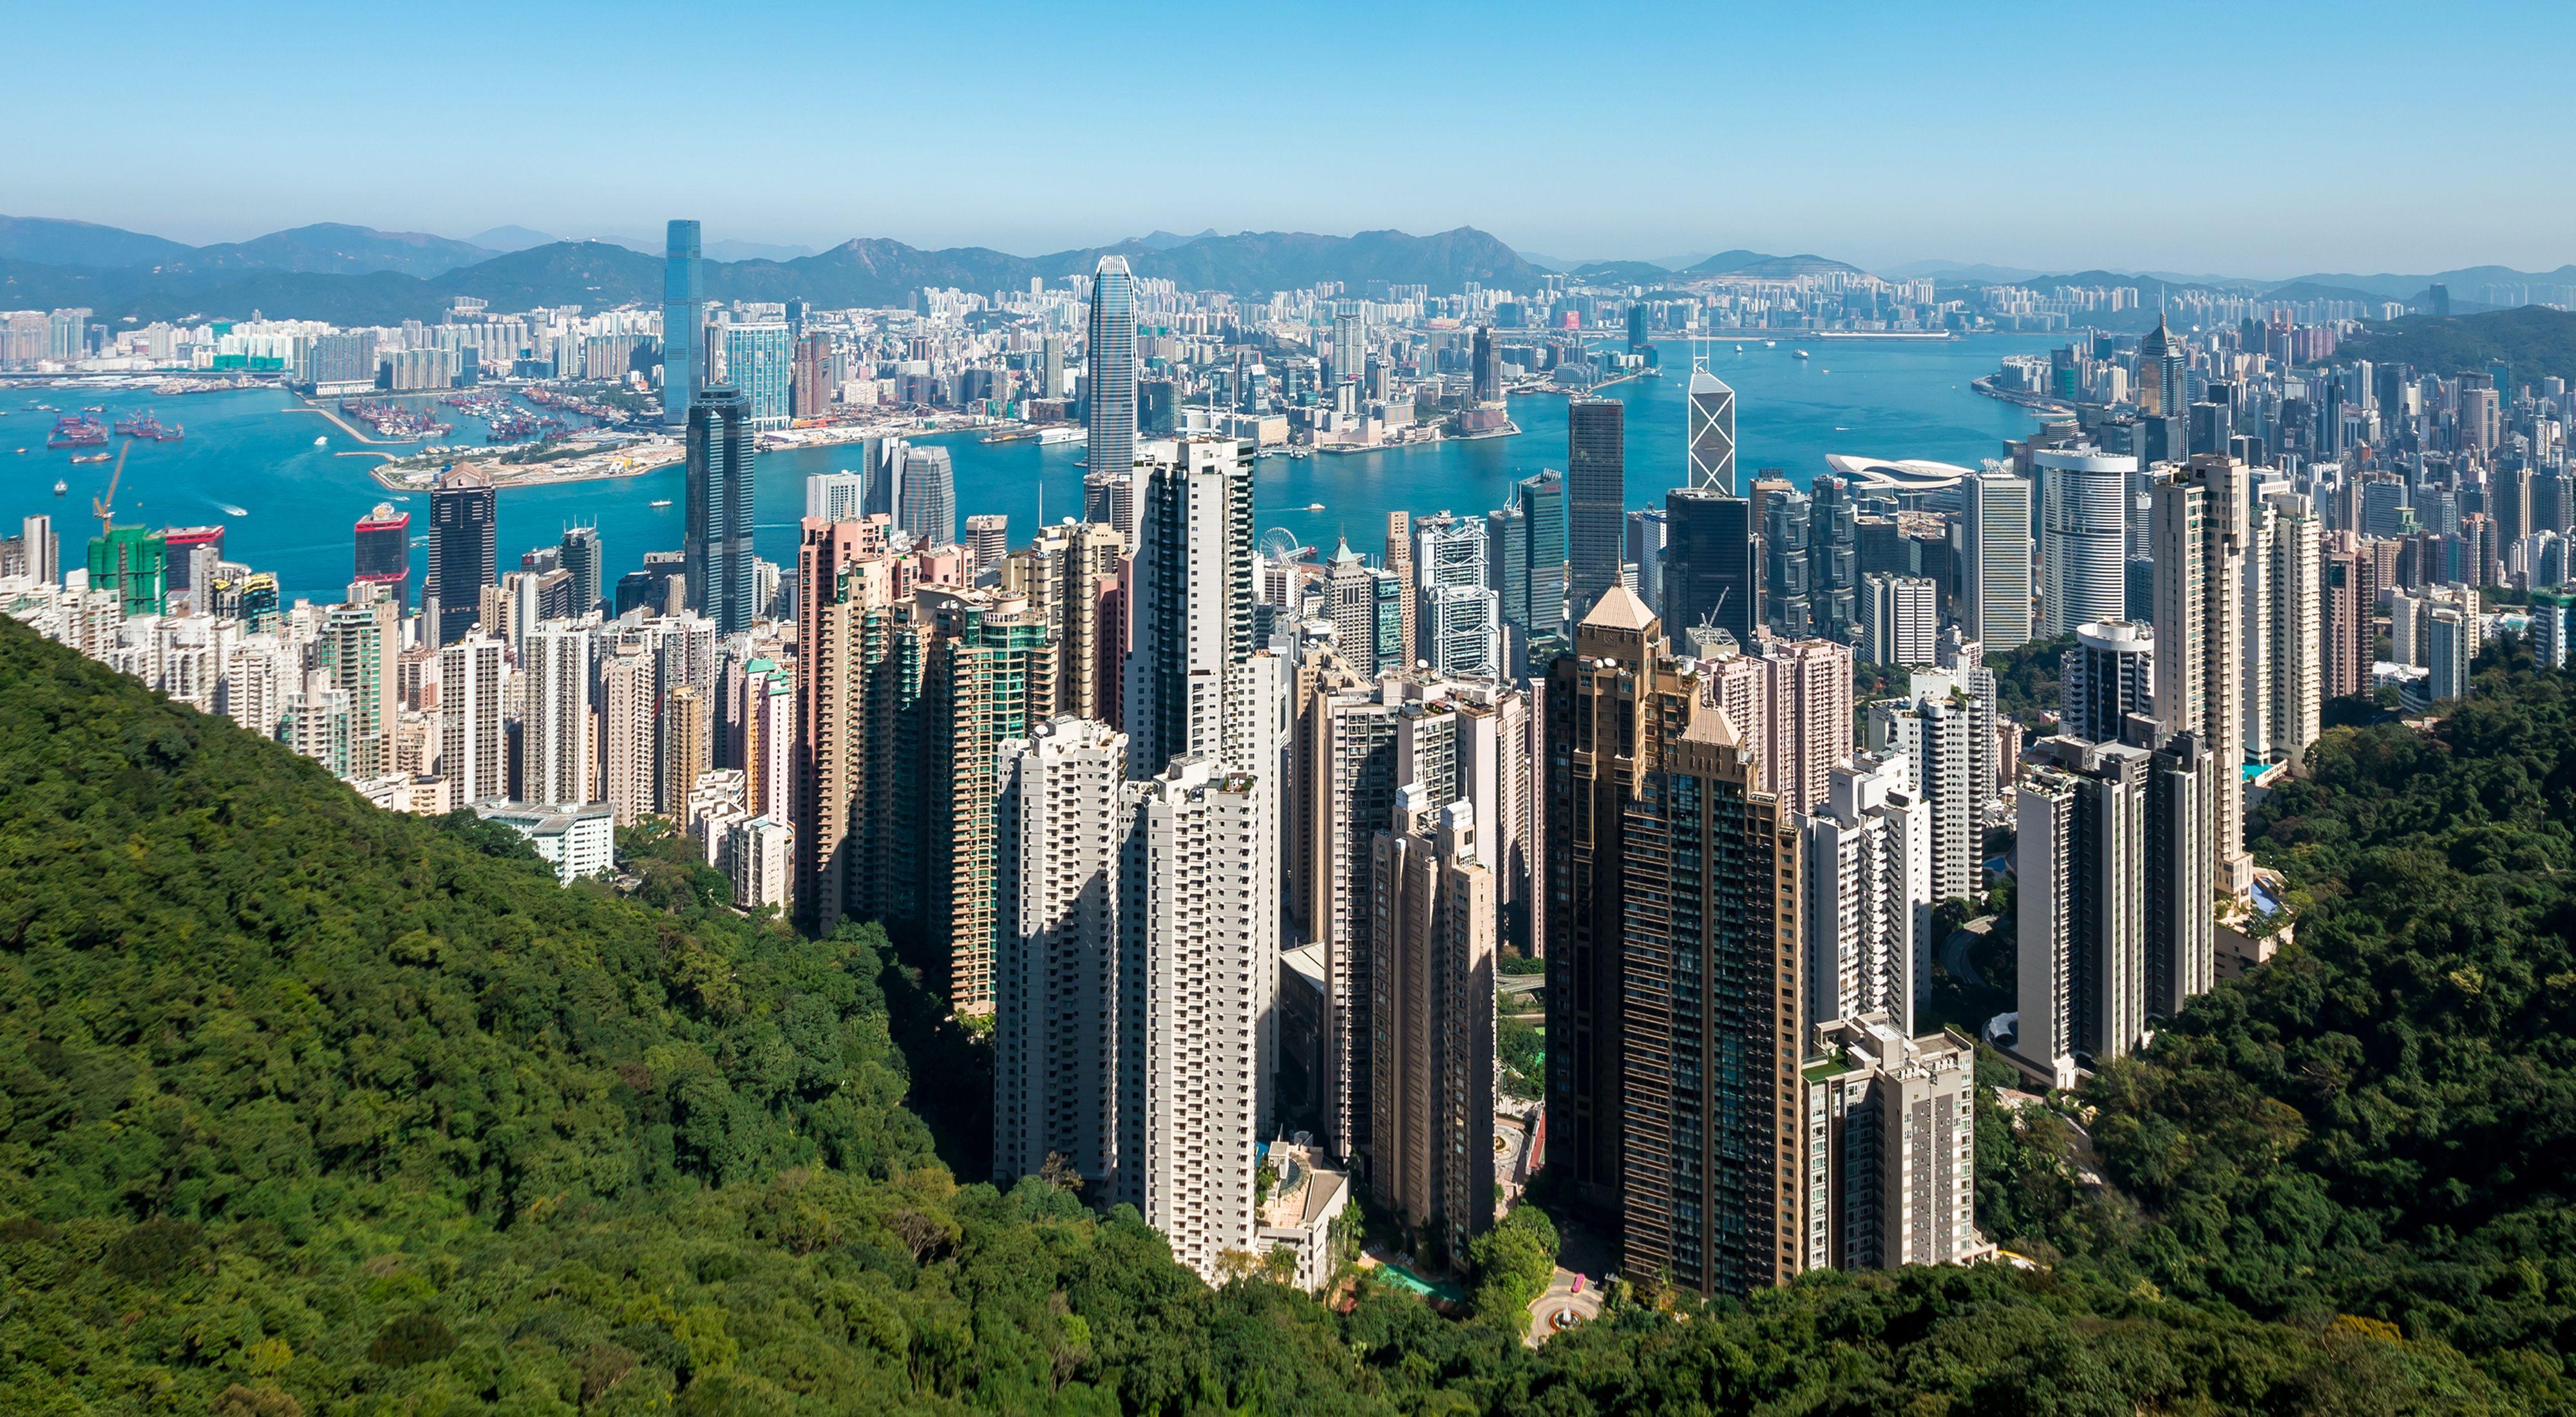 HongKongSkyline - بهترین شهرهای توریستی دنیا کدامند ؟